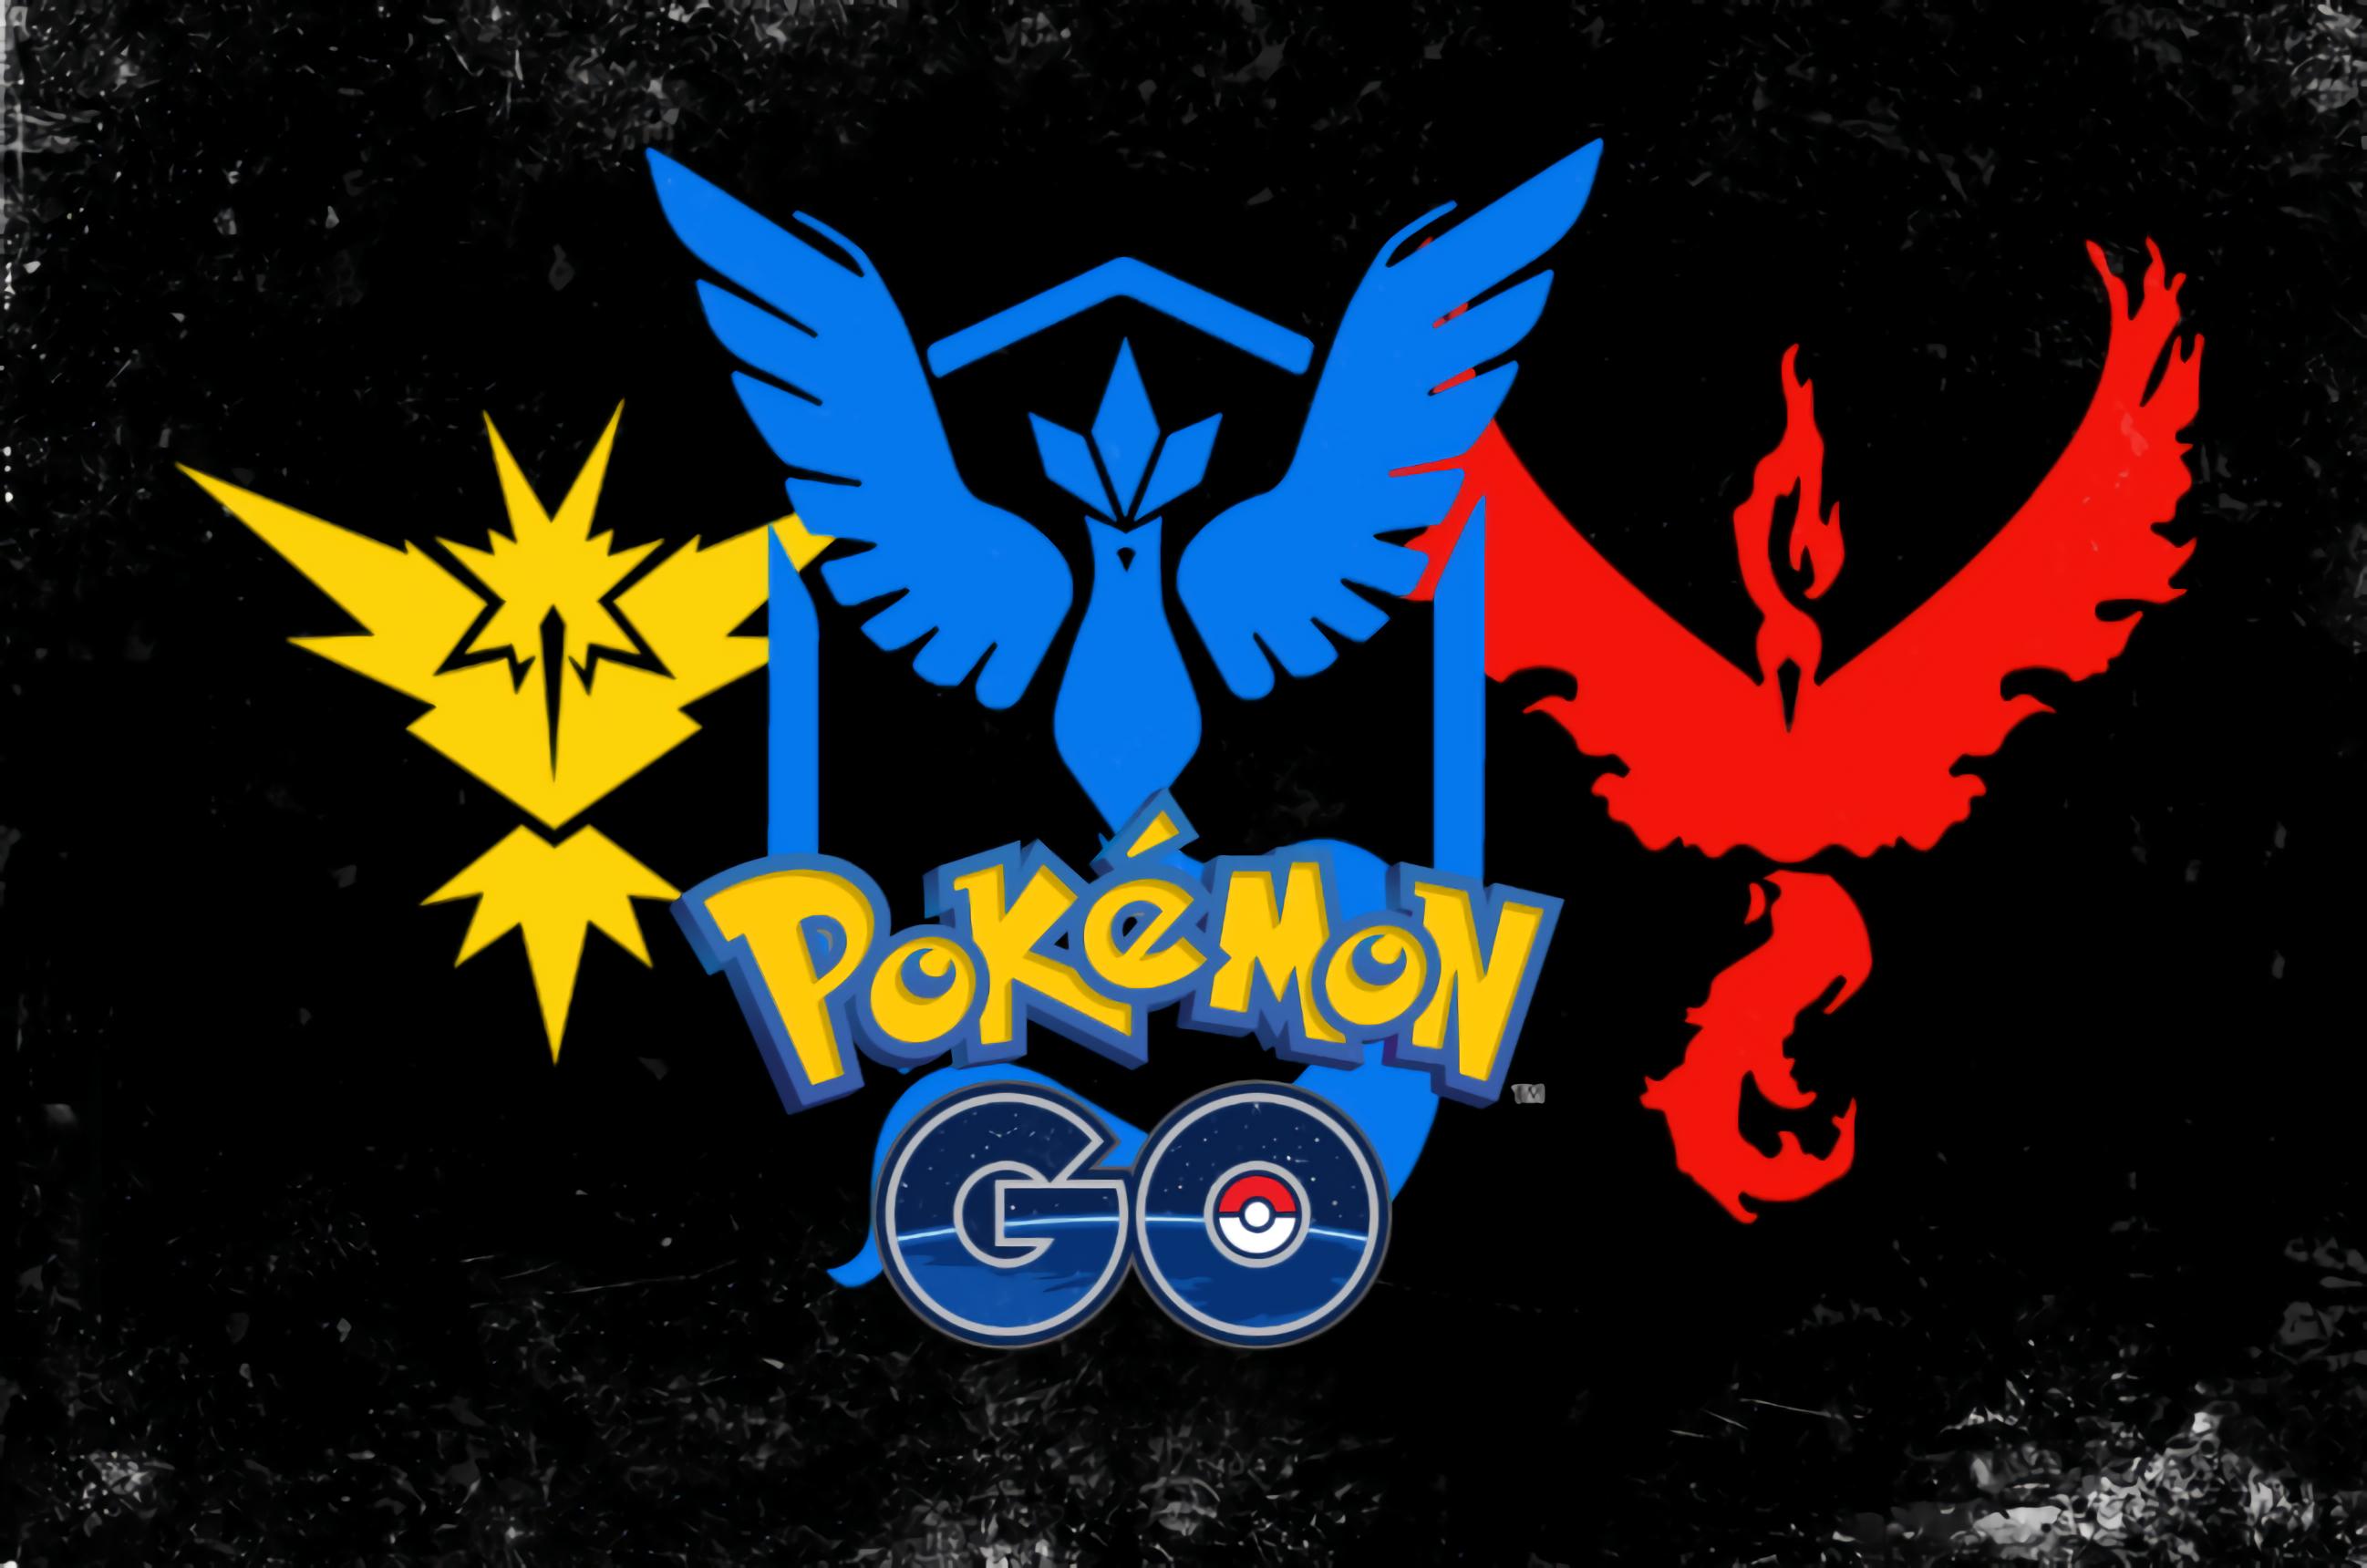 Pokemon GO Full HD Wallpaper And Background Image